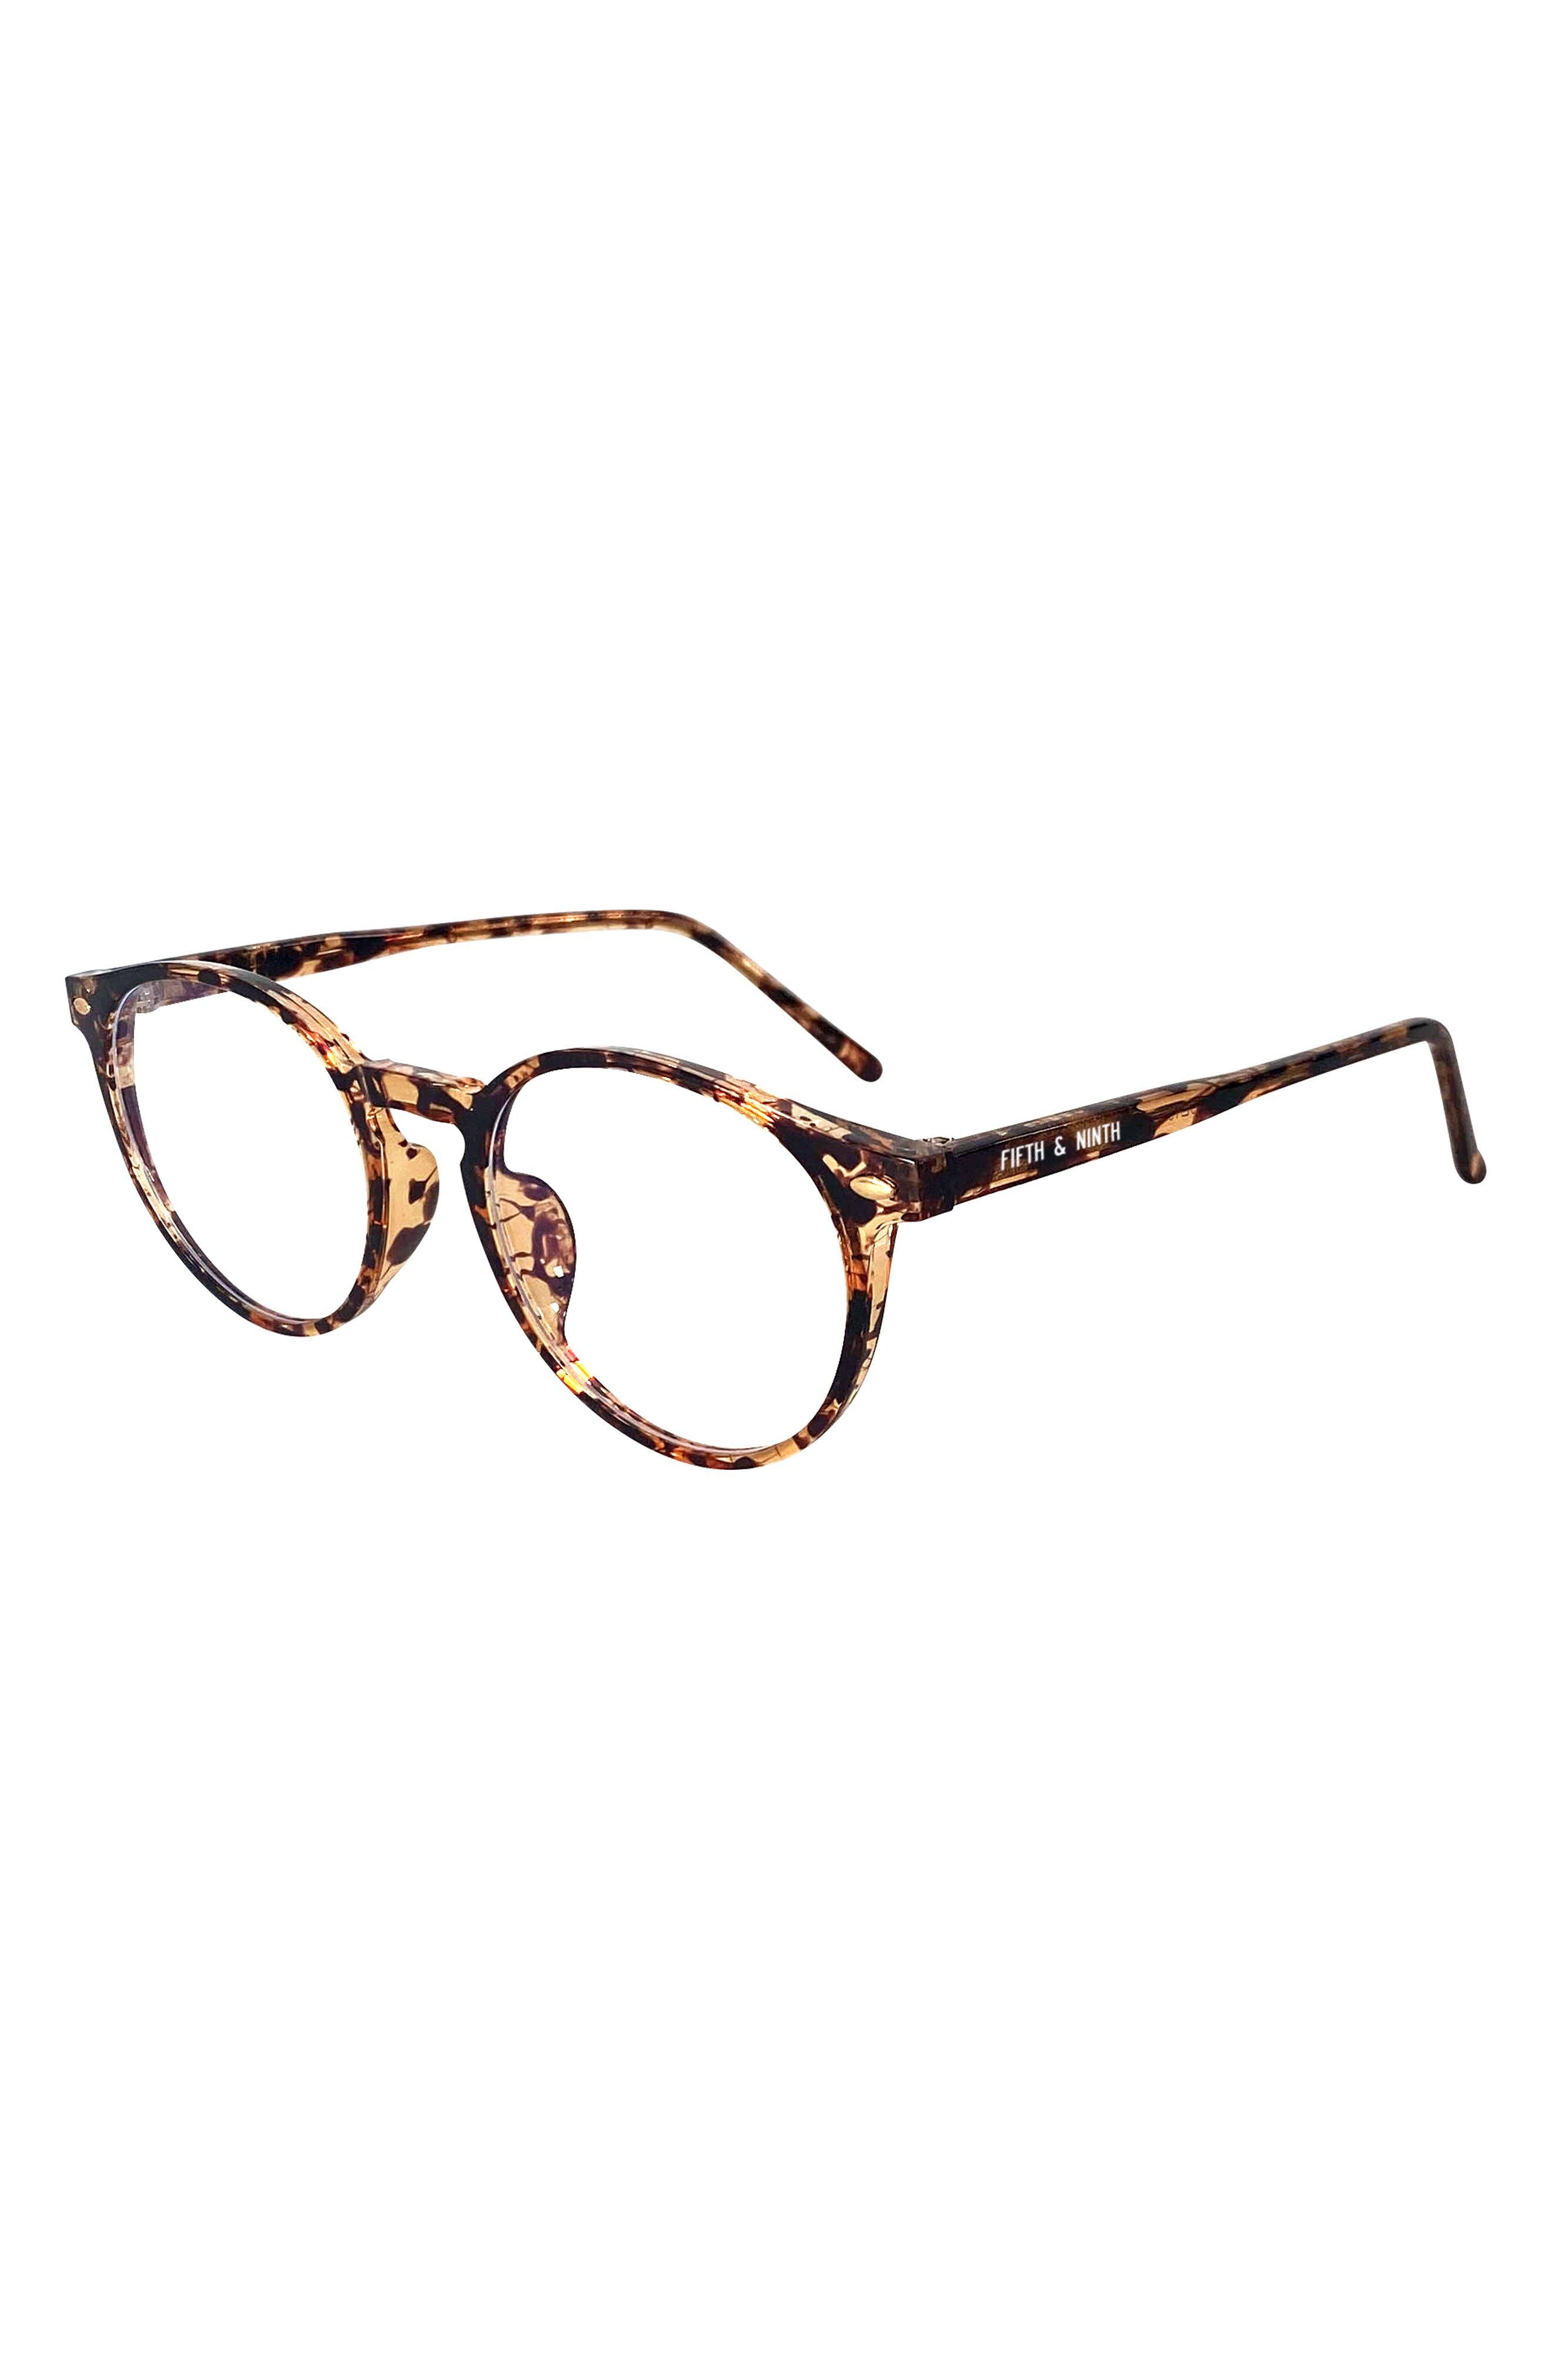 Chandler 53mm Blue Light Filtering Glasses